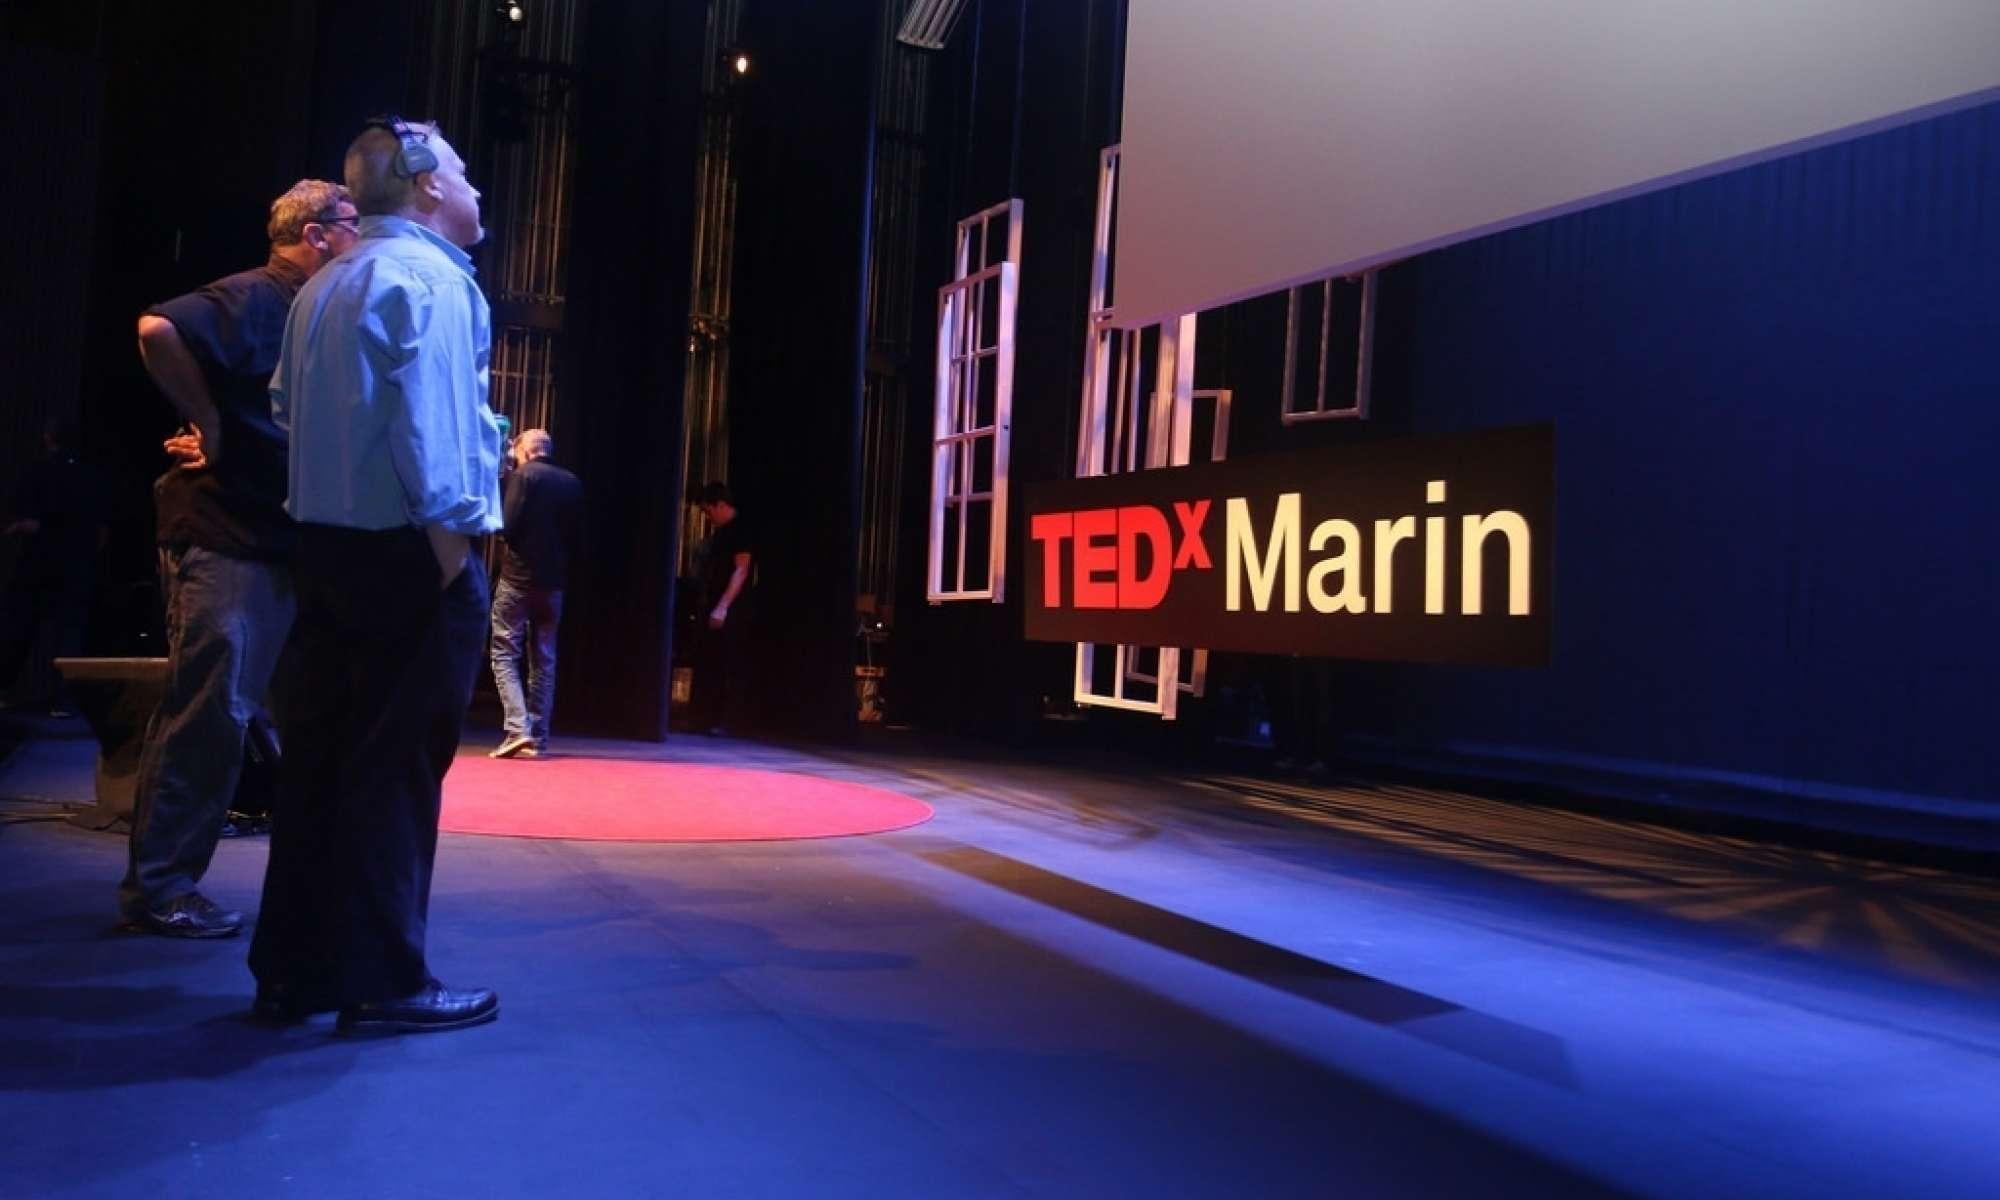 TEDx Marin 2016 - photo: Lori Cheung